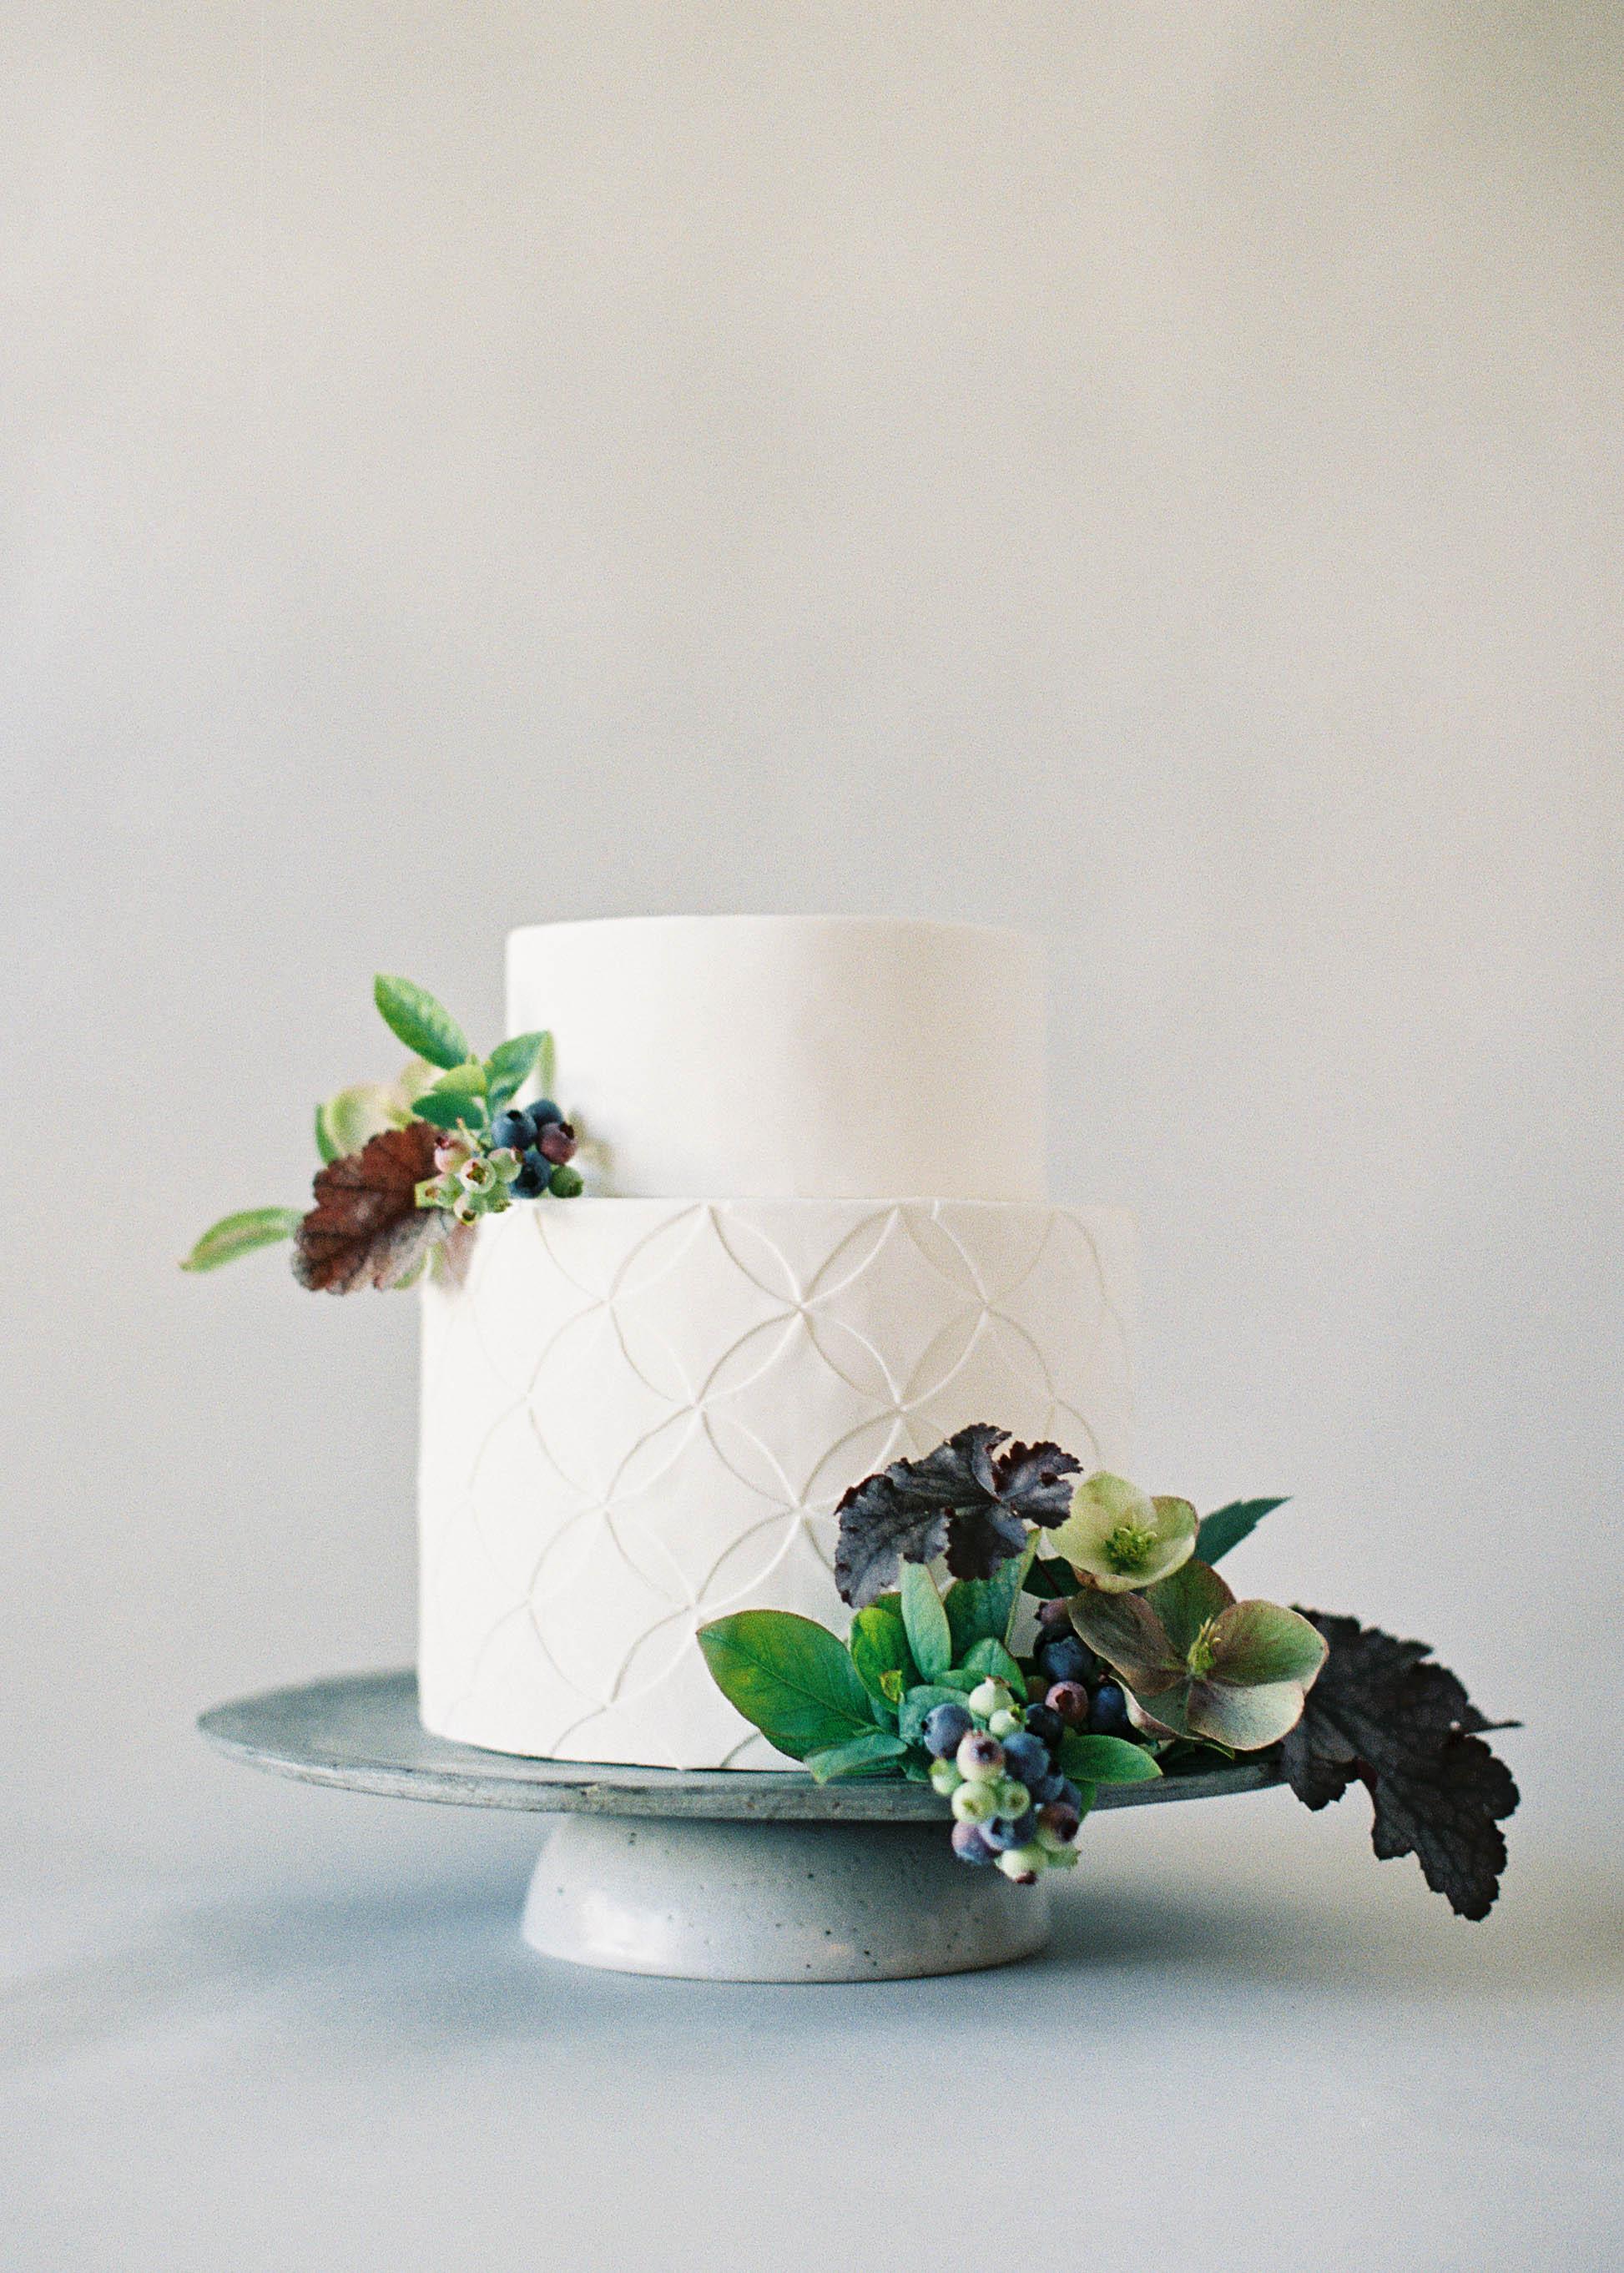 Botanical Cakes - Studio MondineNine Cakes